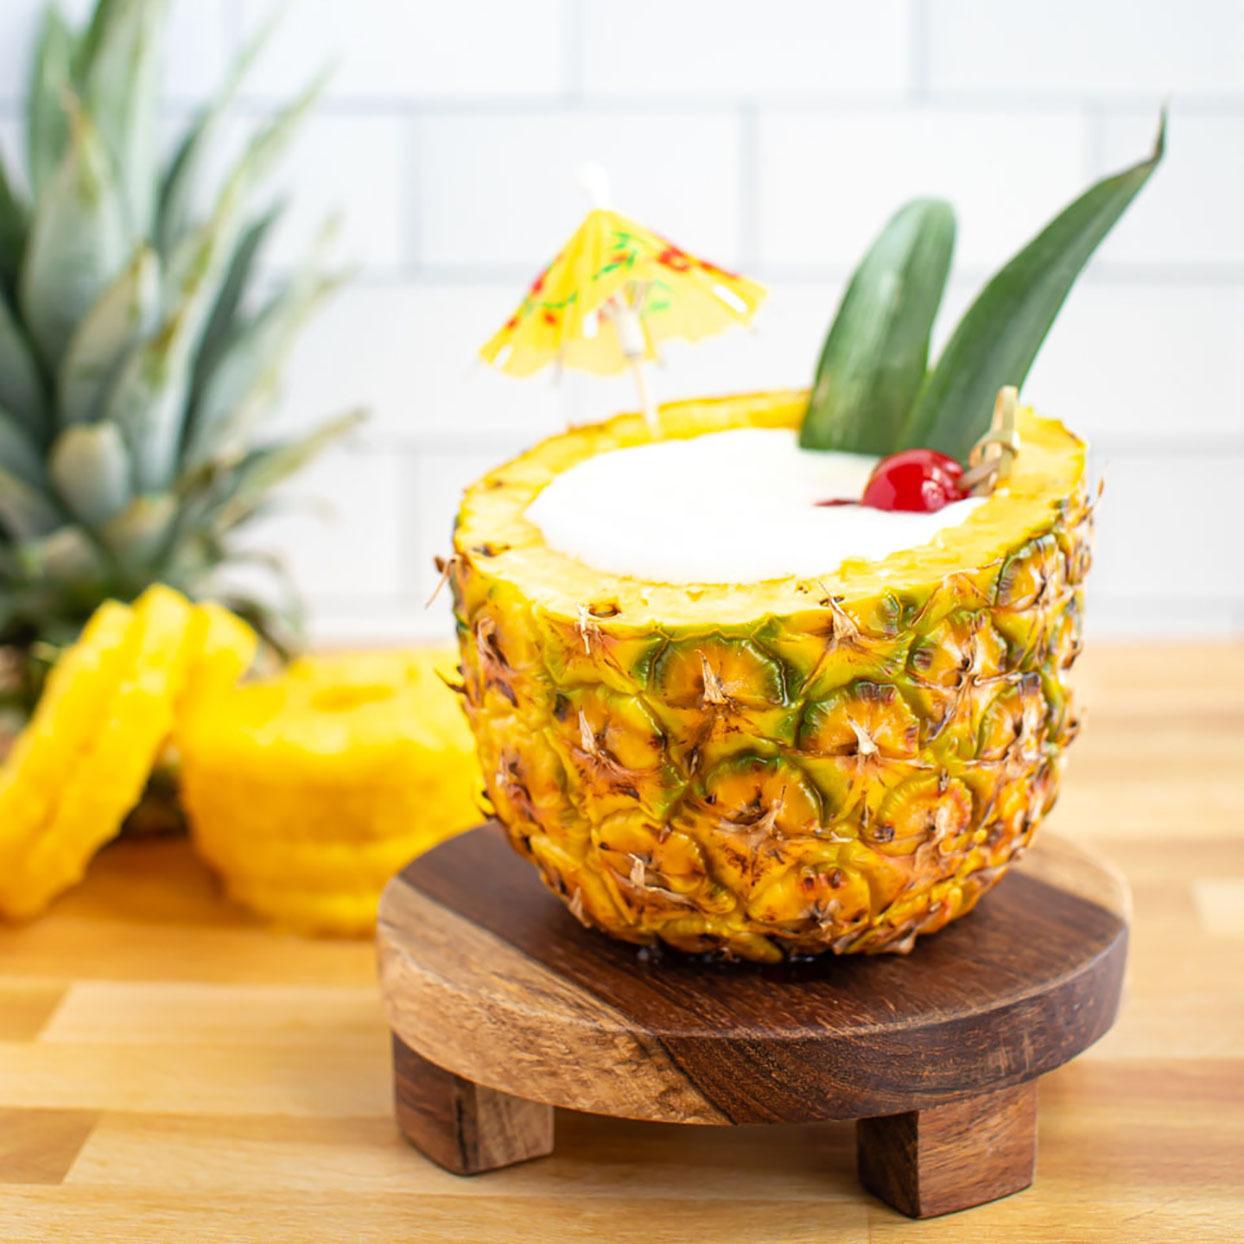 Piña Colada in a Pineapple Allrecipes Trusted Brands